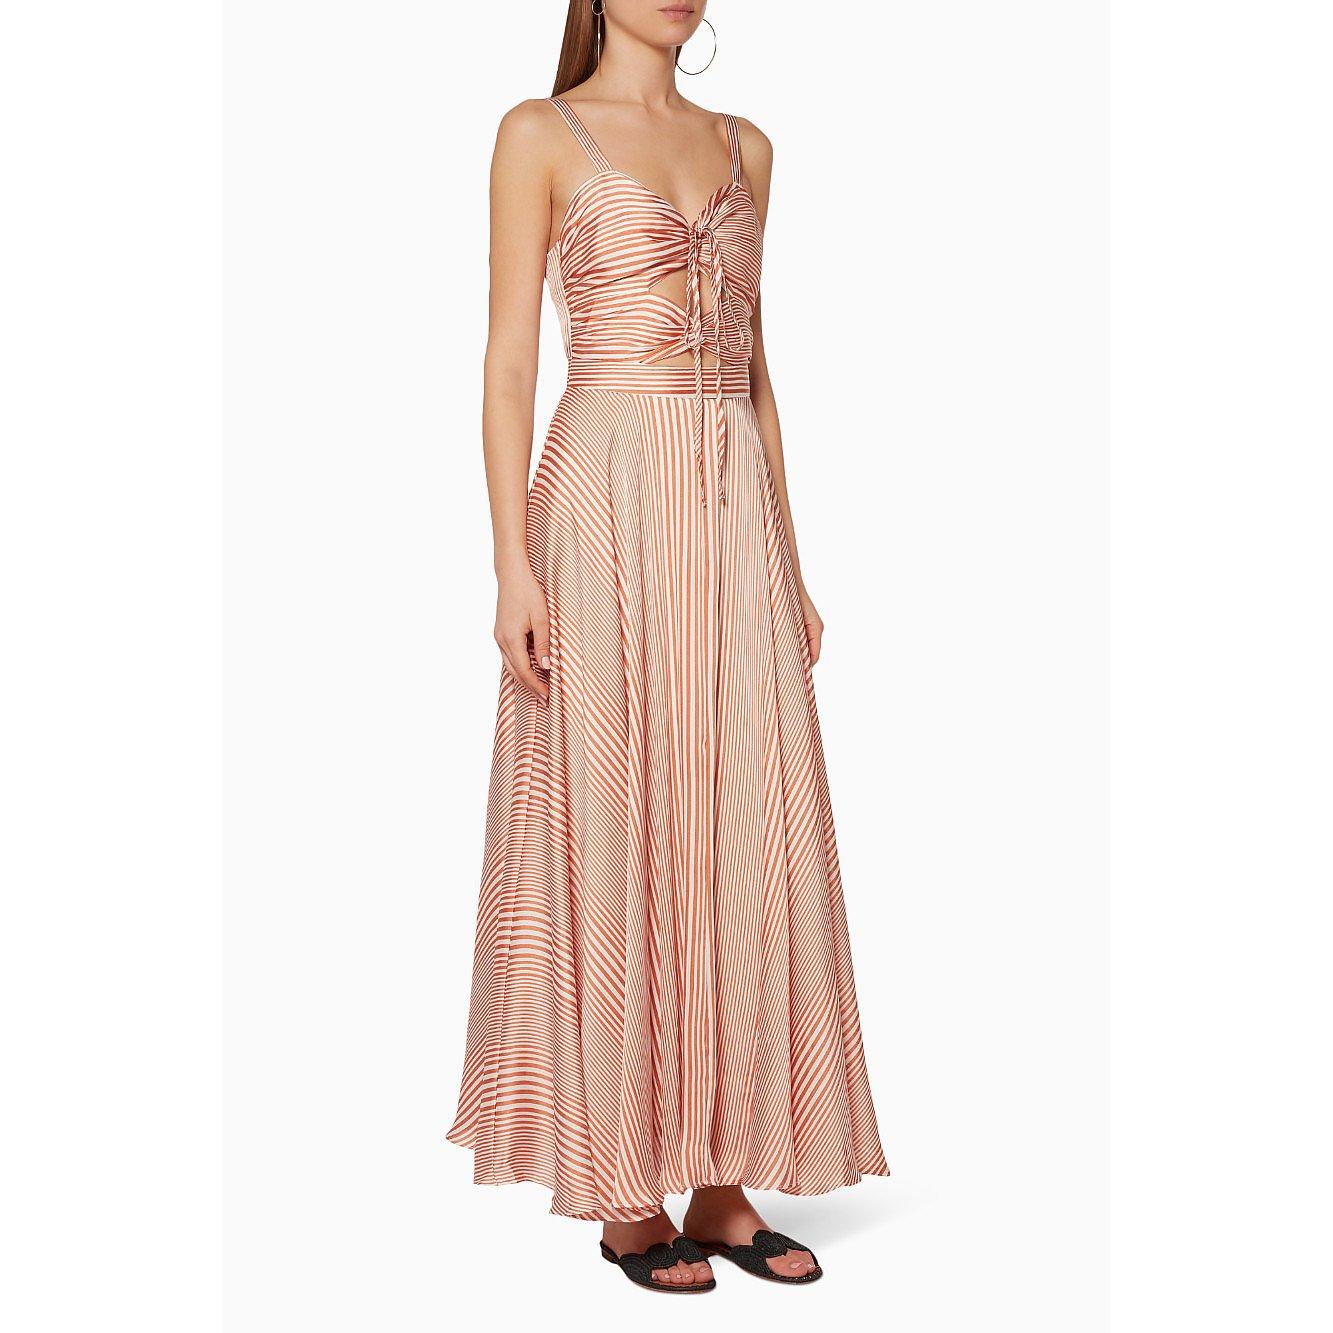 Azulu Monroe Striped Dress